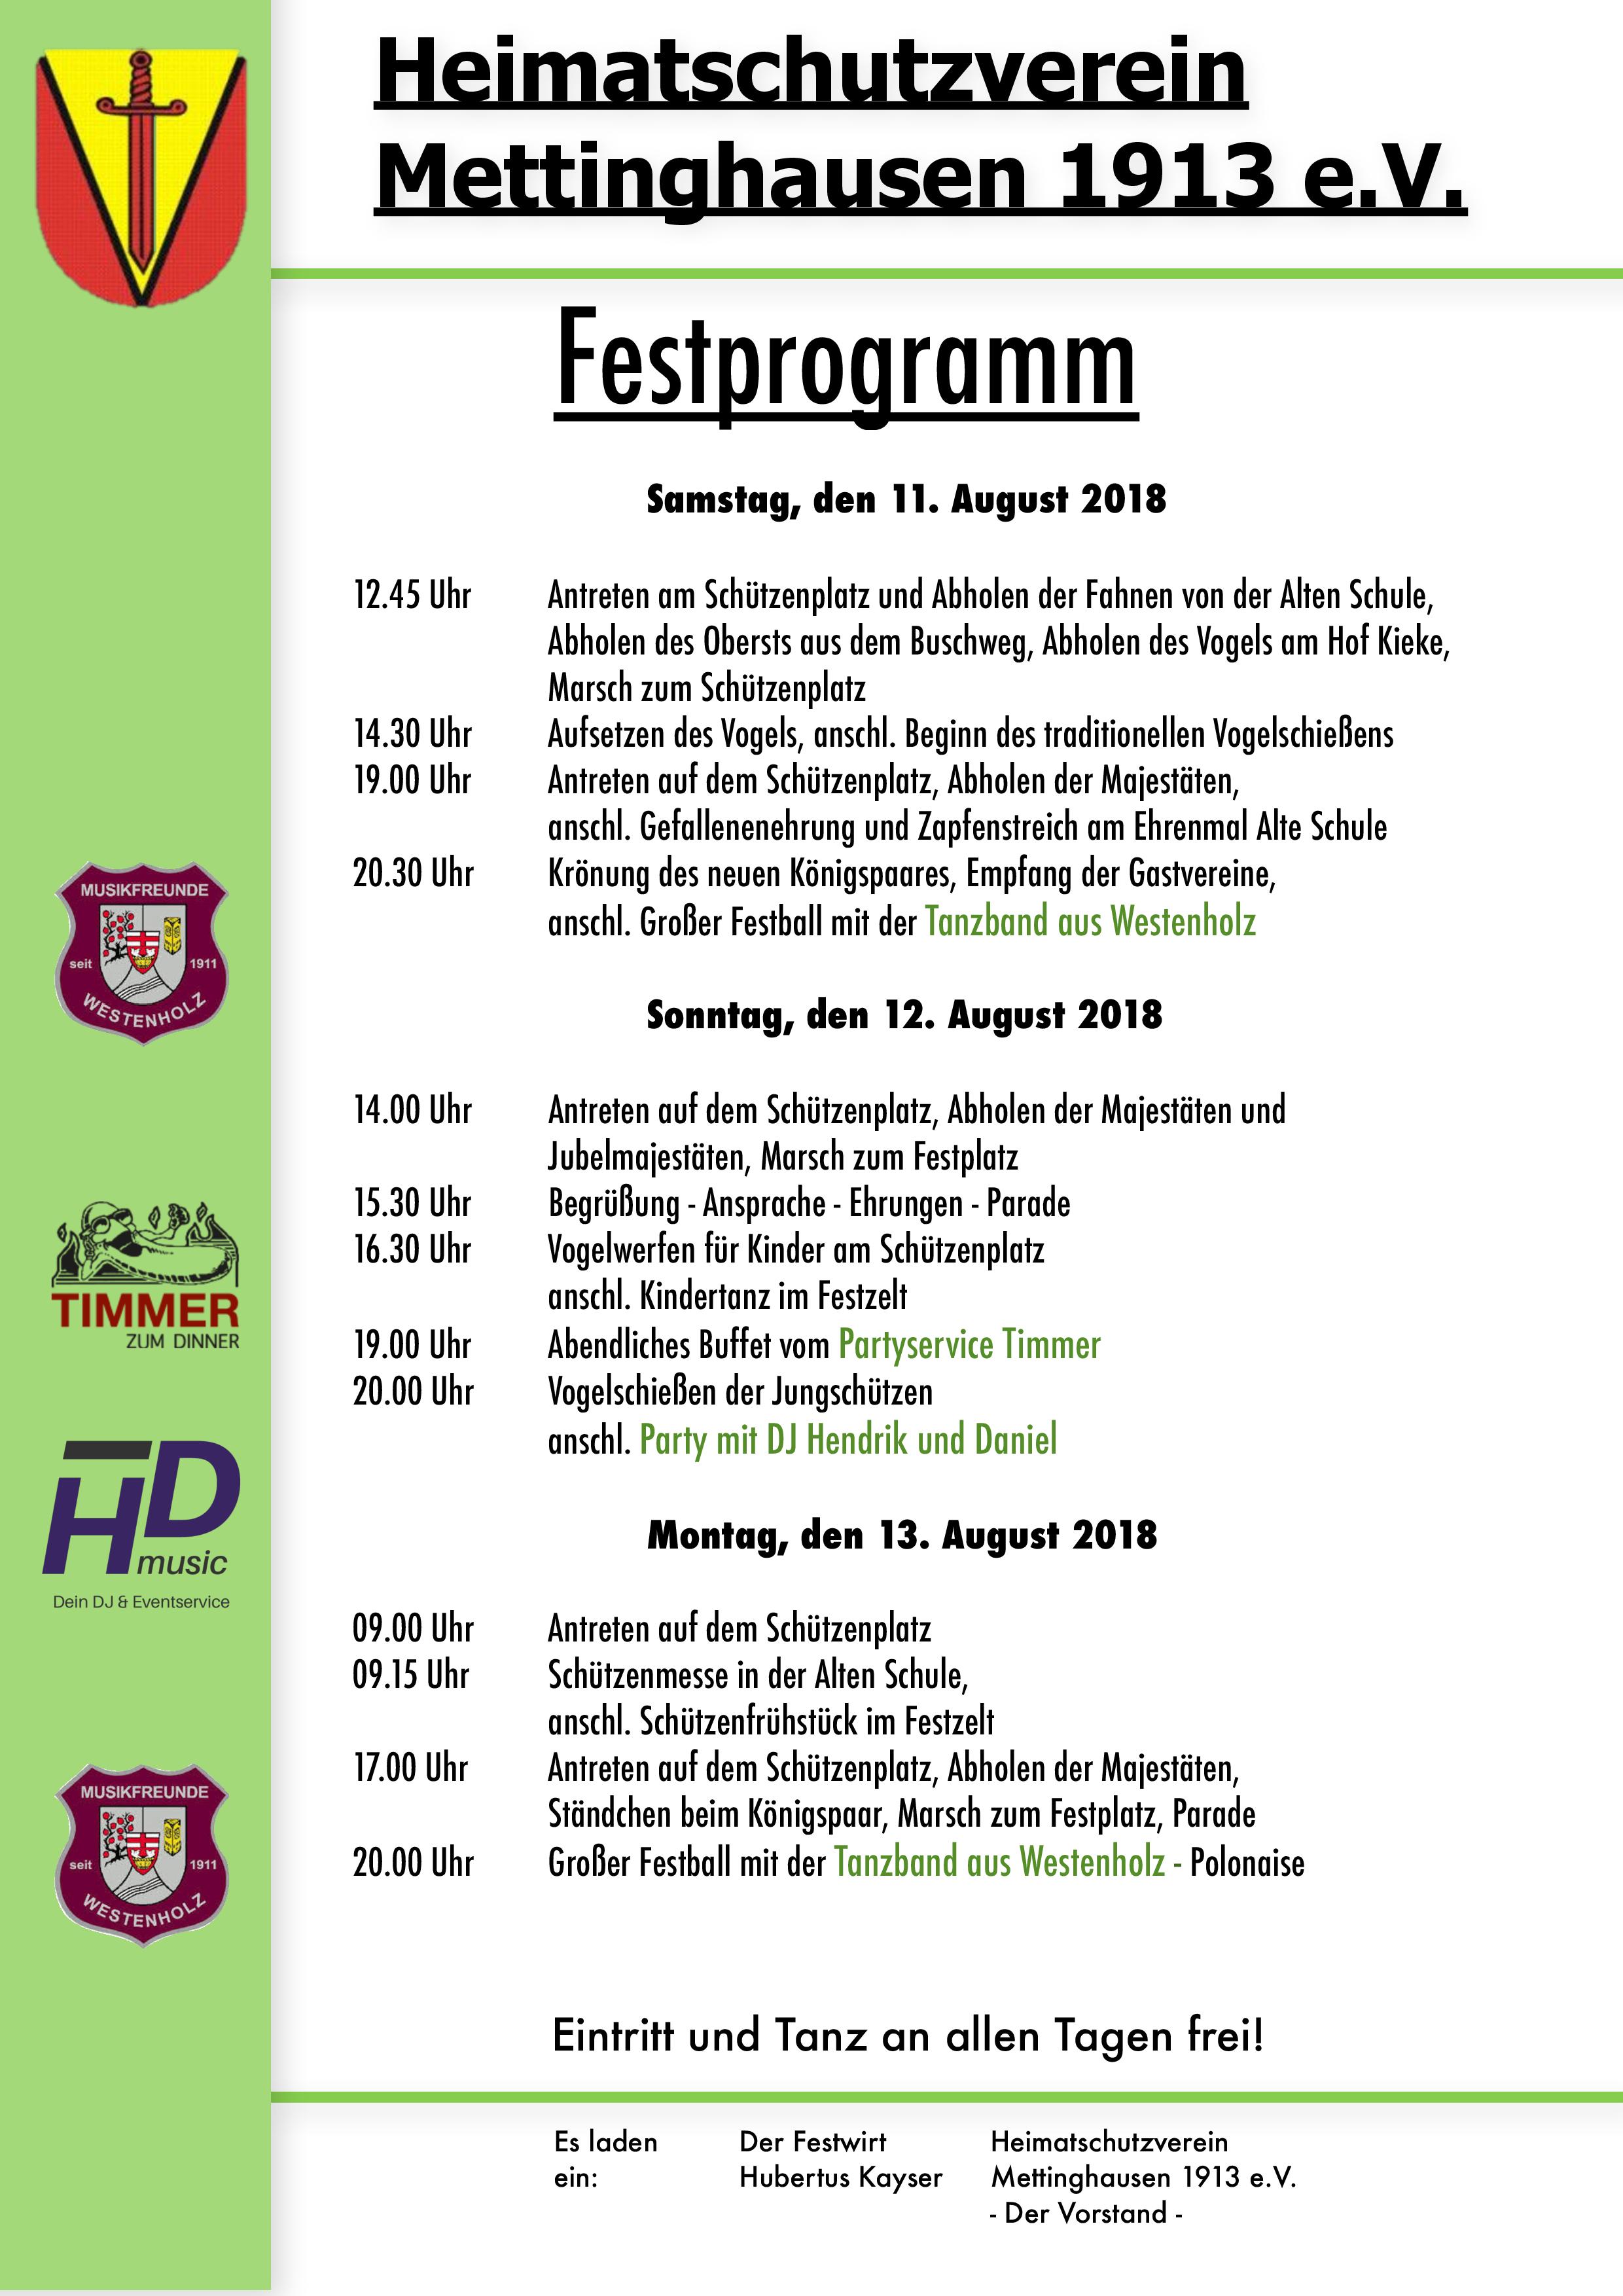 Festprogramm 2018